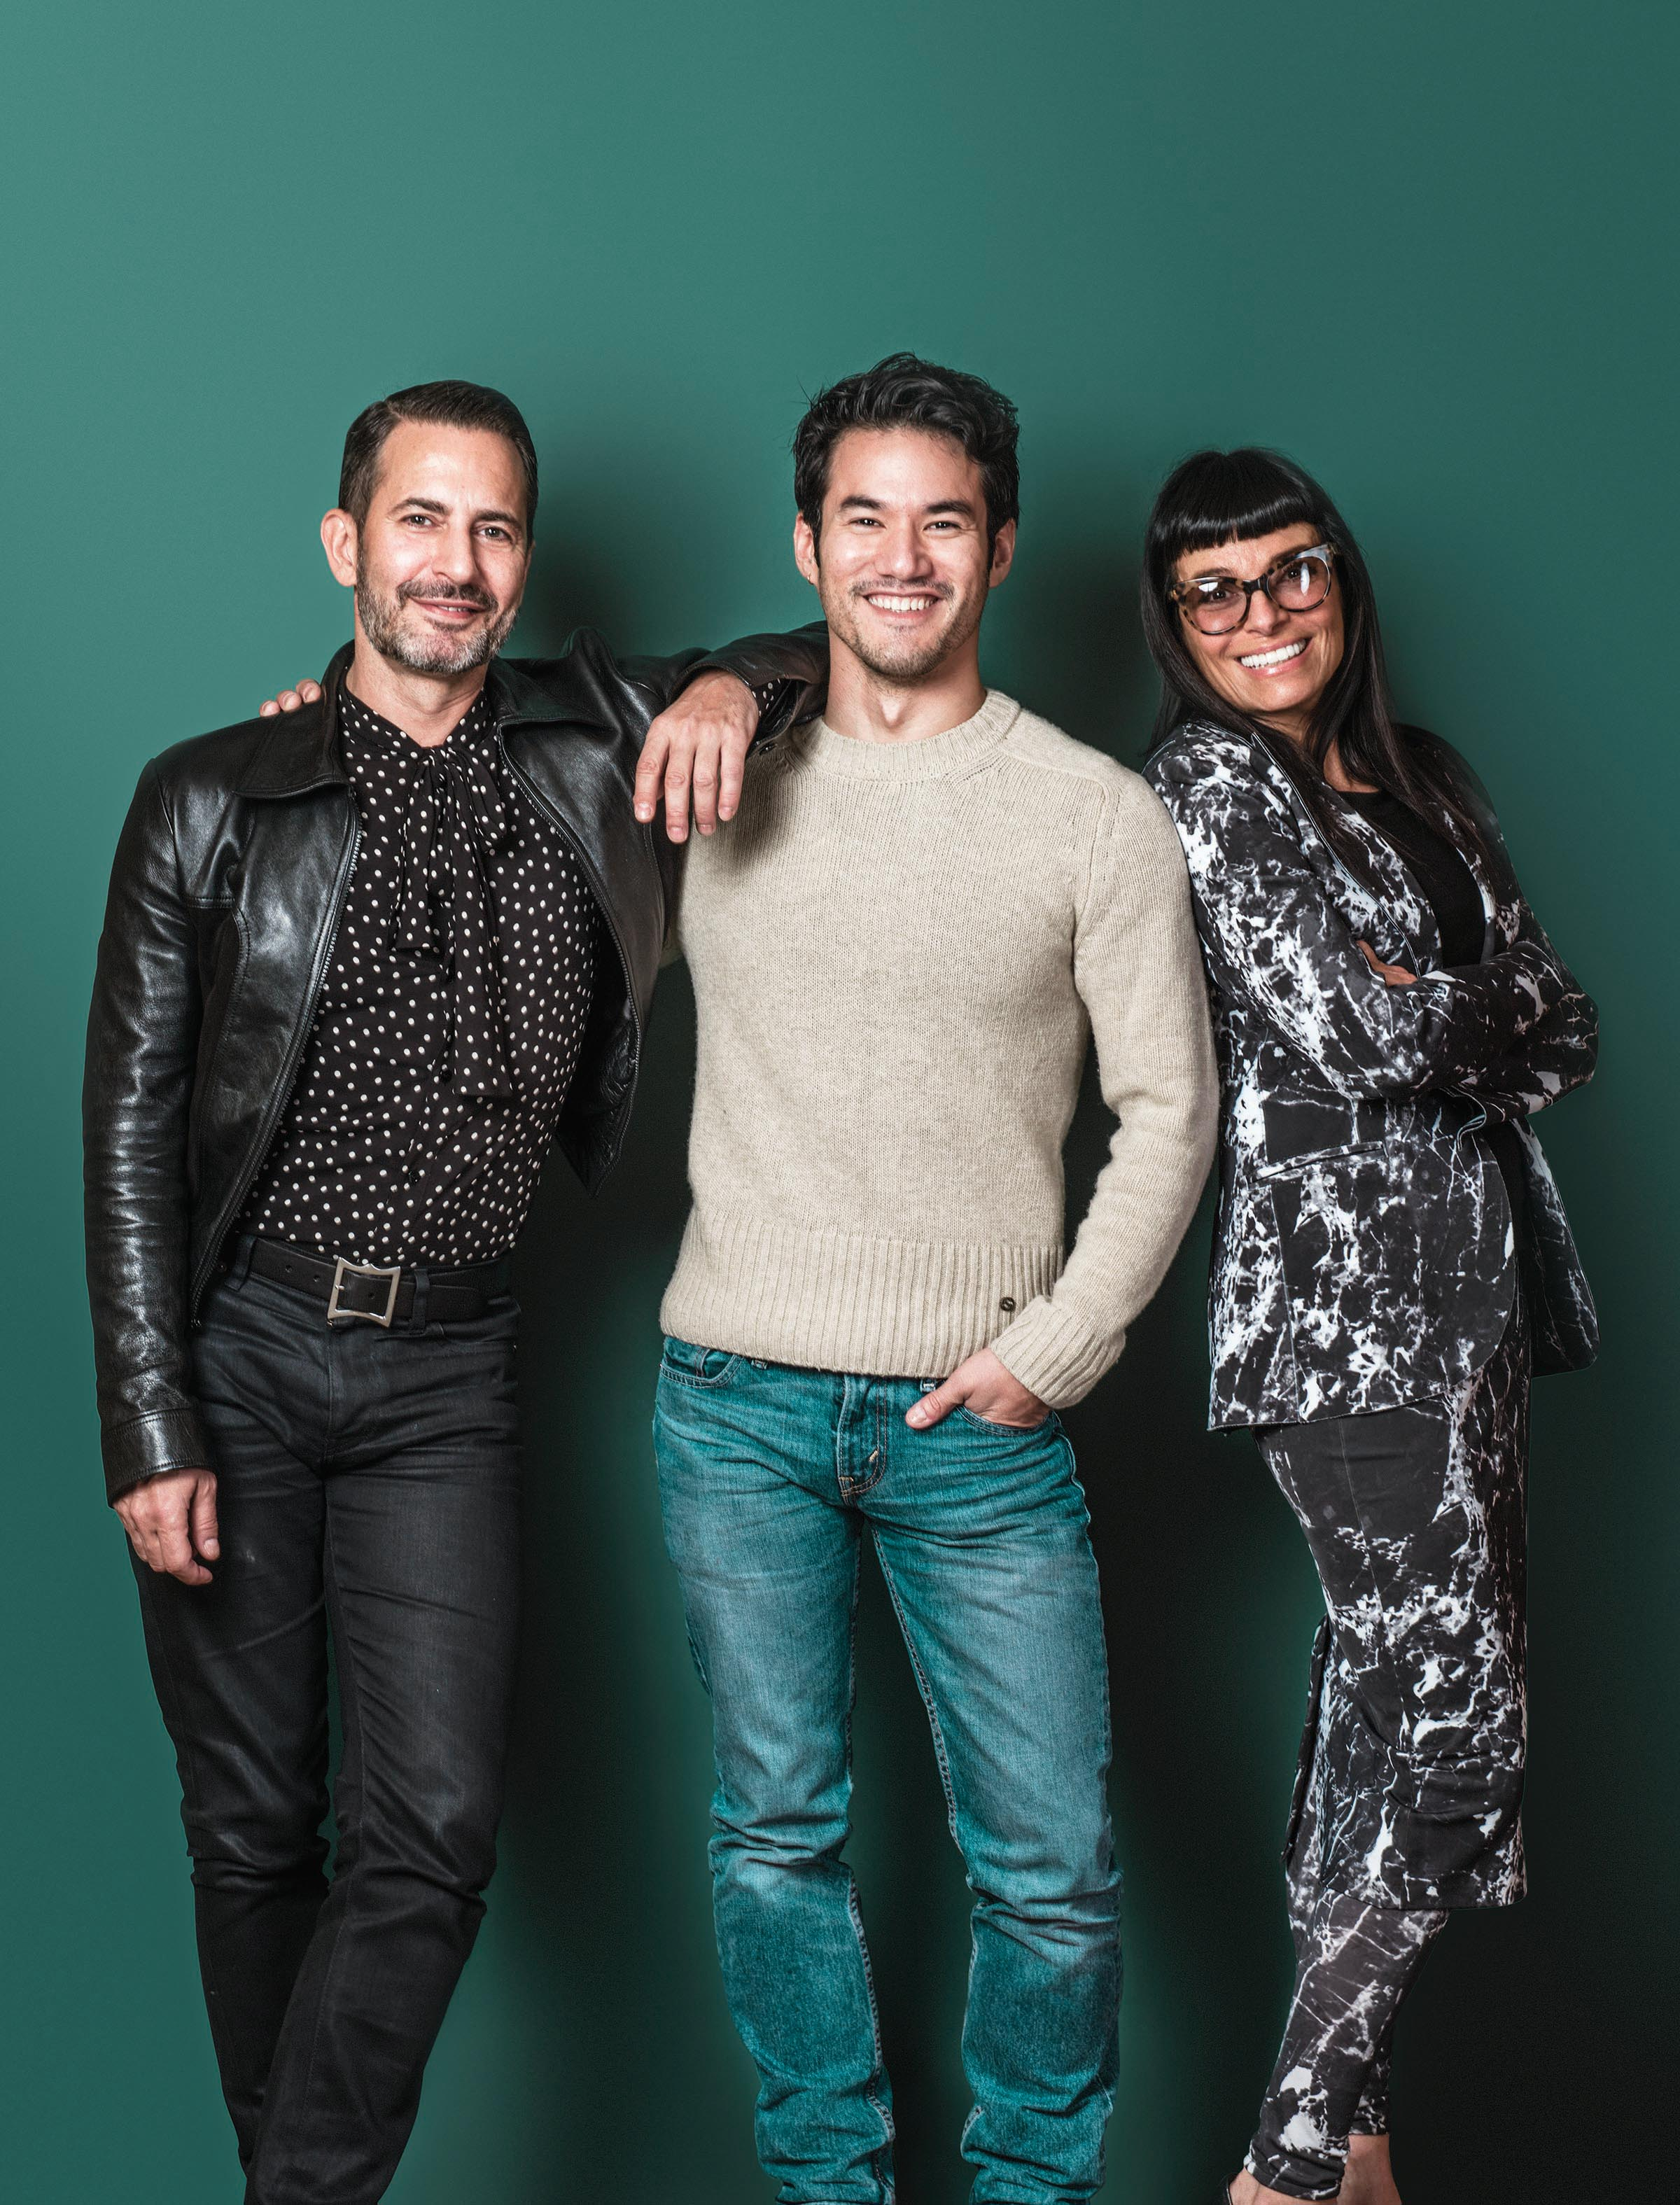 Marc Jacobs, Joseph Altuzarra, Norma Kamali.